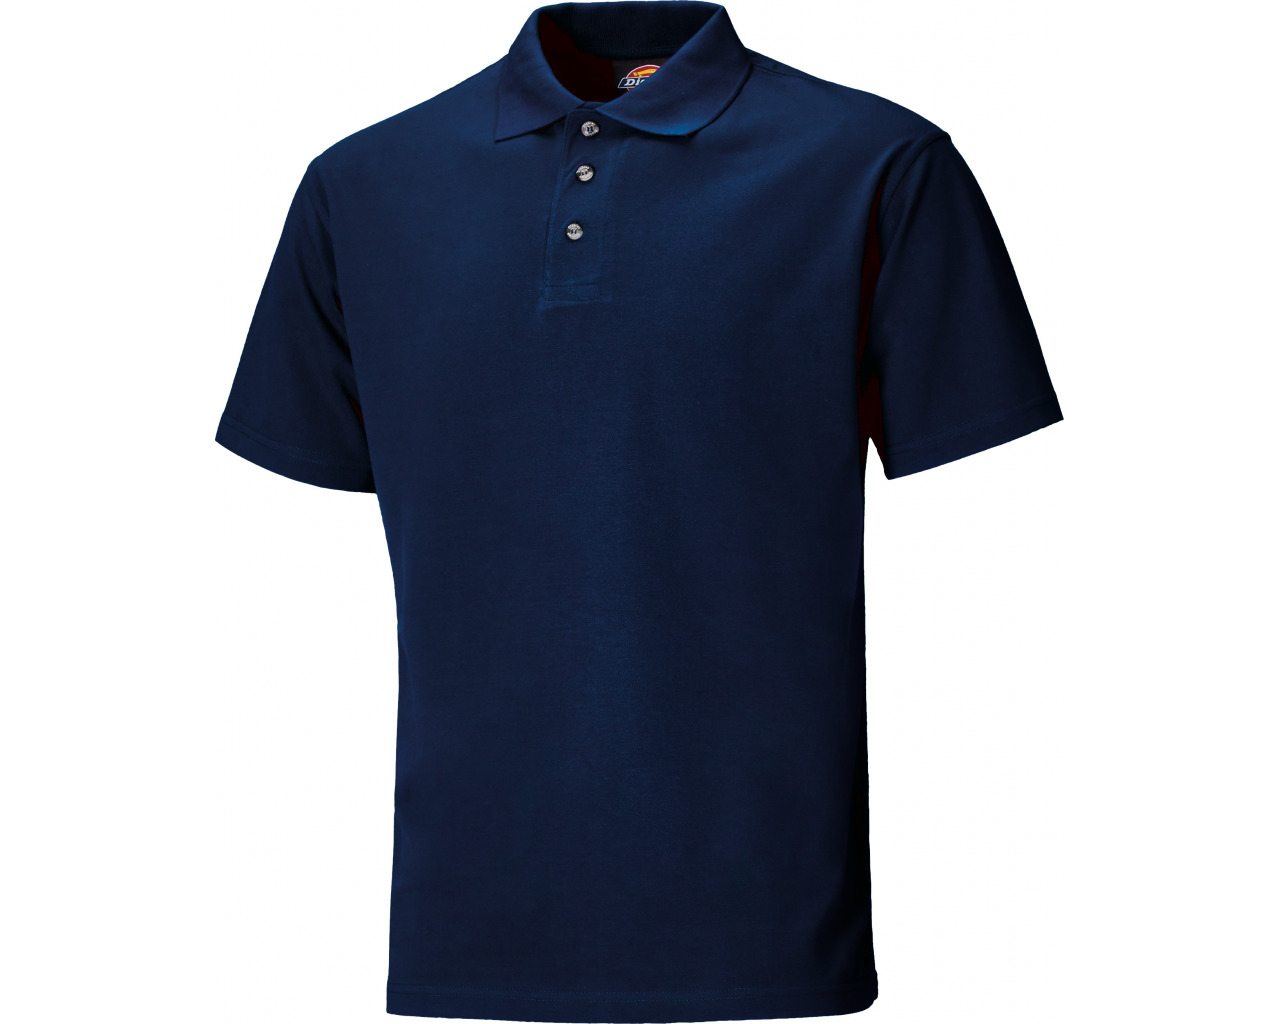 Dickies Navy Short Sleeve Polo Shirt 1